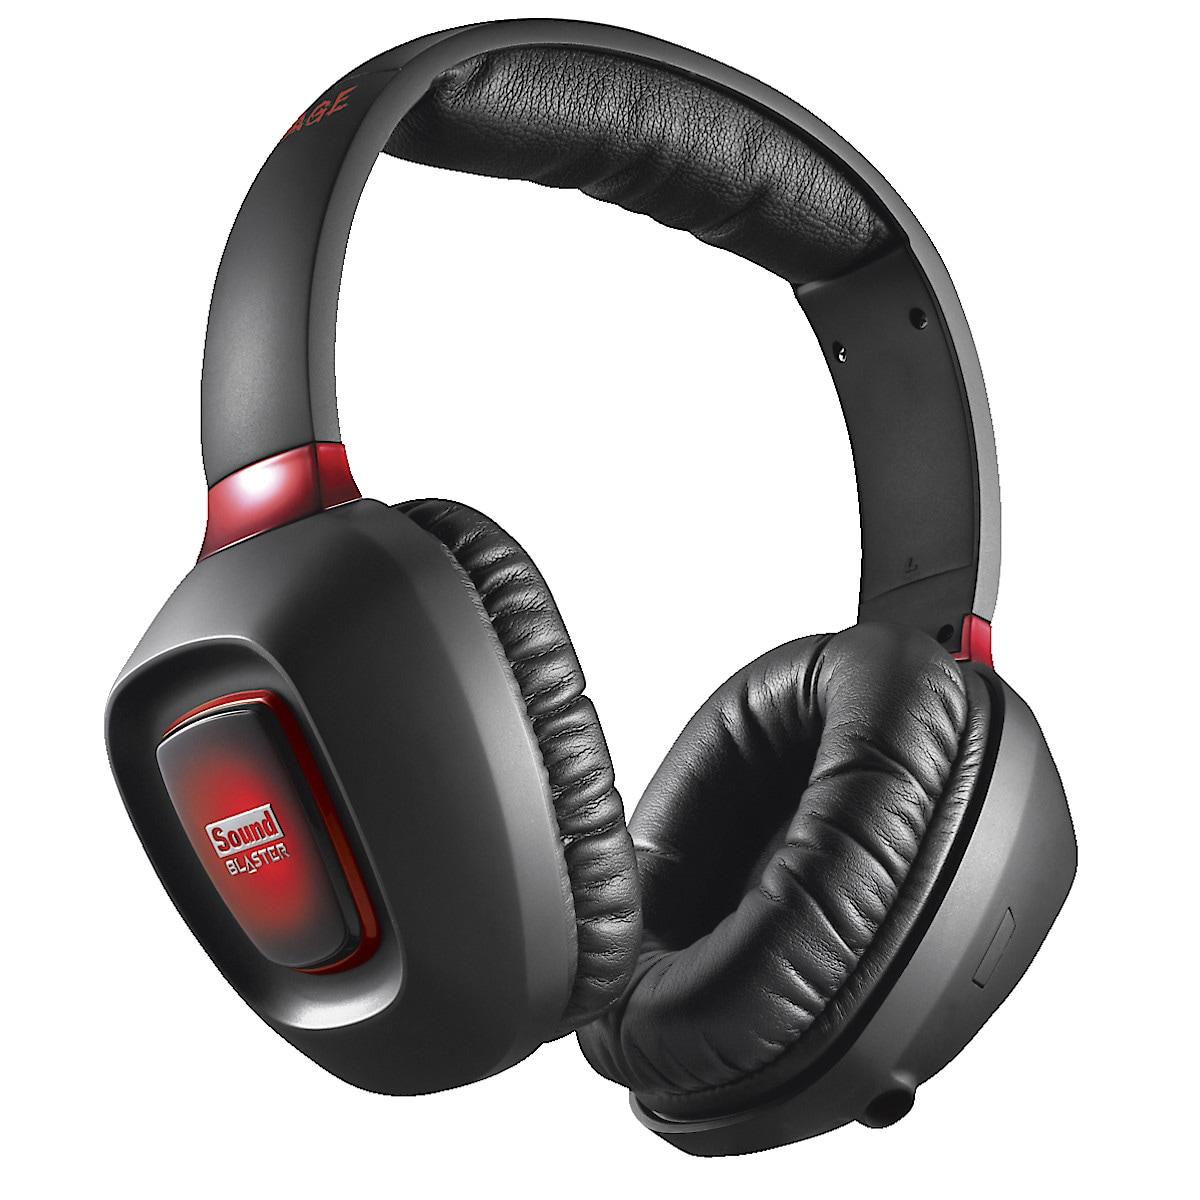 Trådlöst Gaming-headset, Soundblaster Tactic 3D Rage